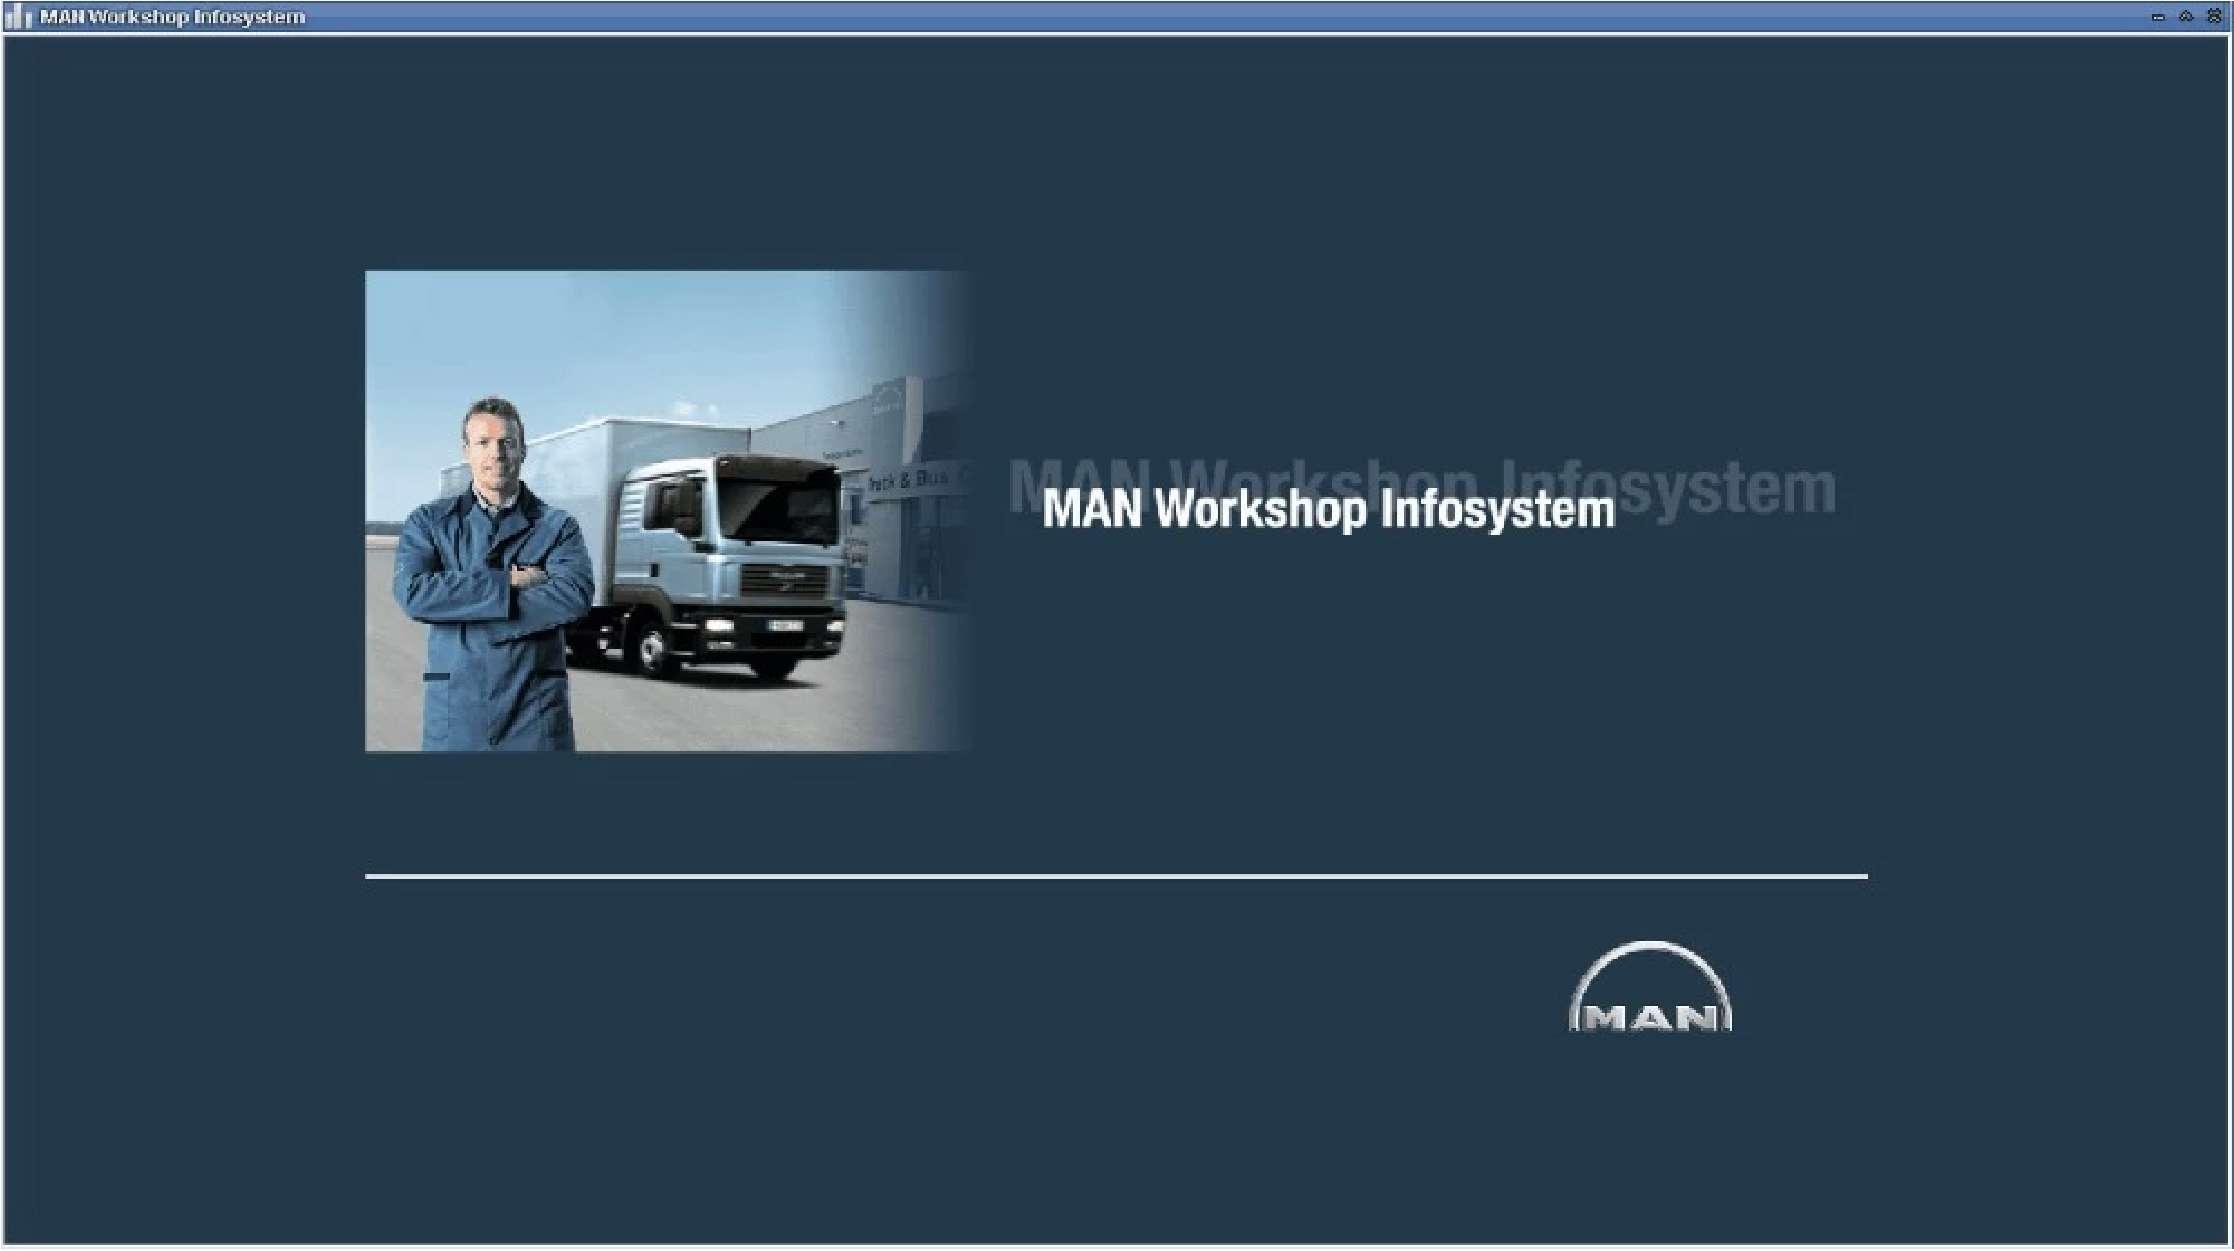 MAN WIS (Workshop Infosystem) 2015 ss-01